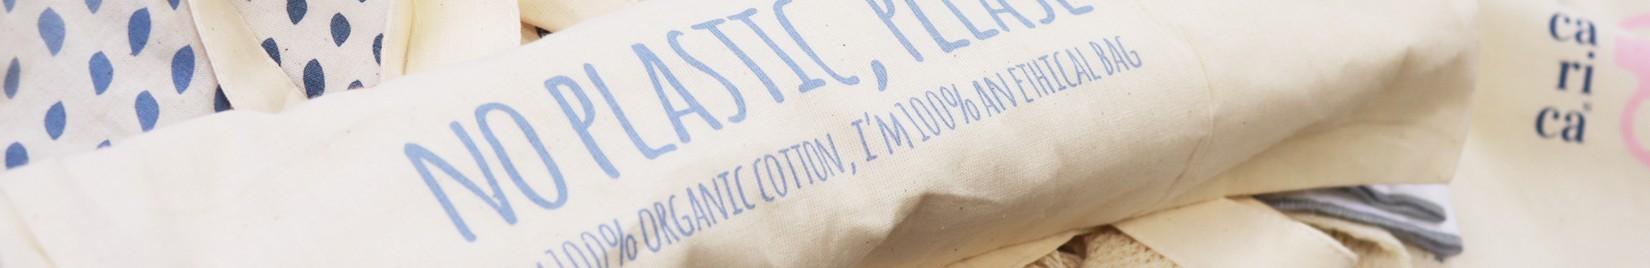 La sélection de textiles de Negozio Leggero